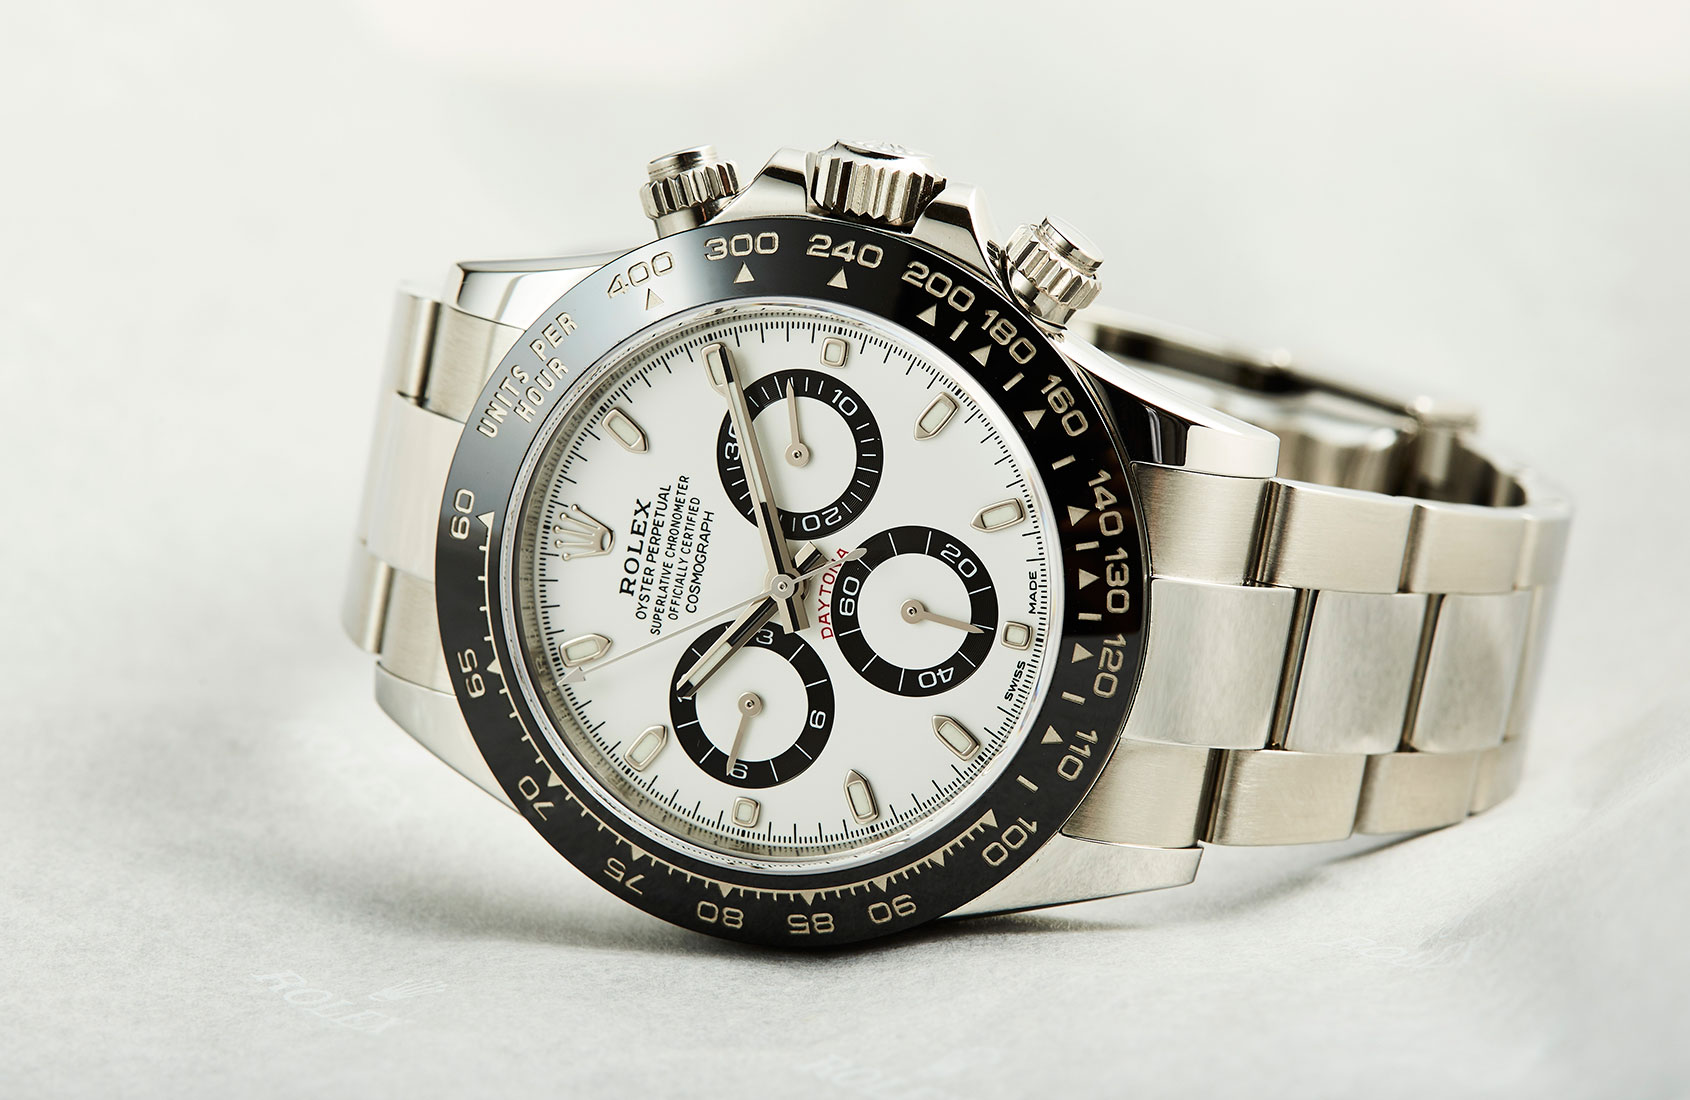 Best case scenario: What are the best watch case materials?